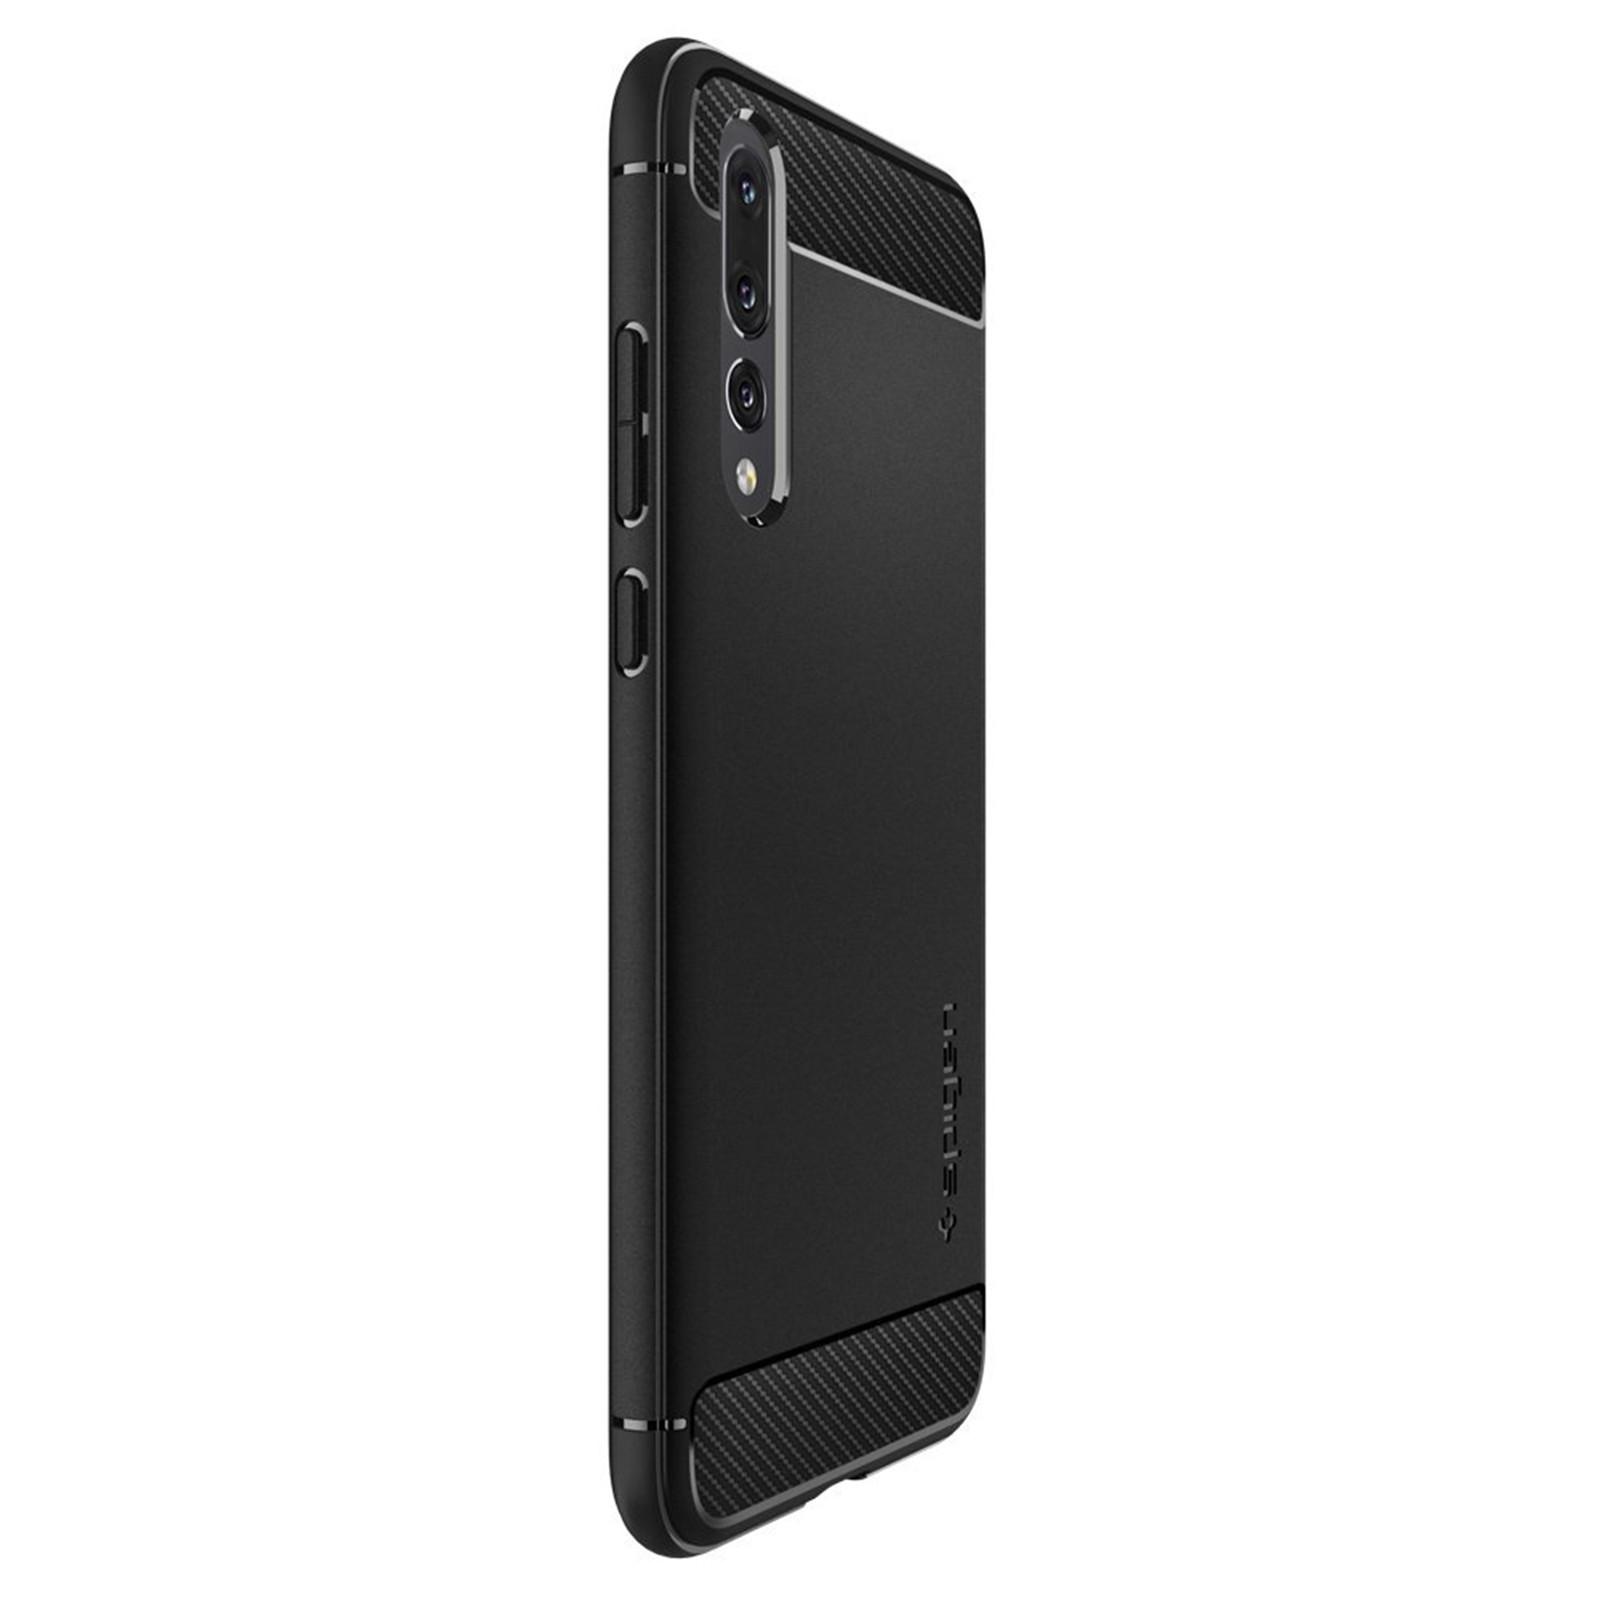 Spigen Huawei P20 Pro Rugged Armour Case - Black